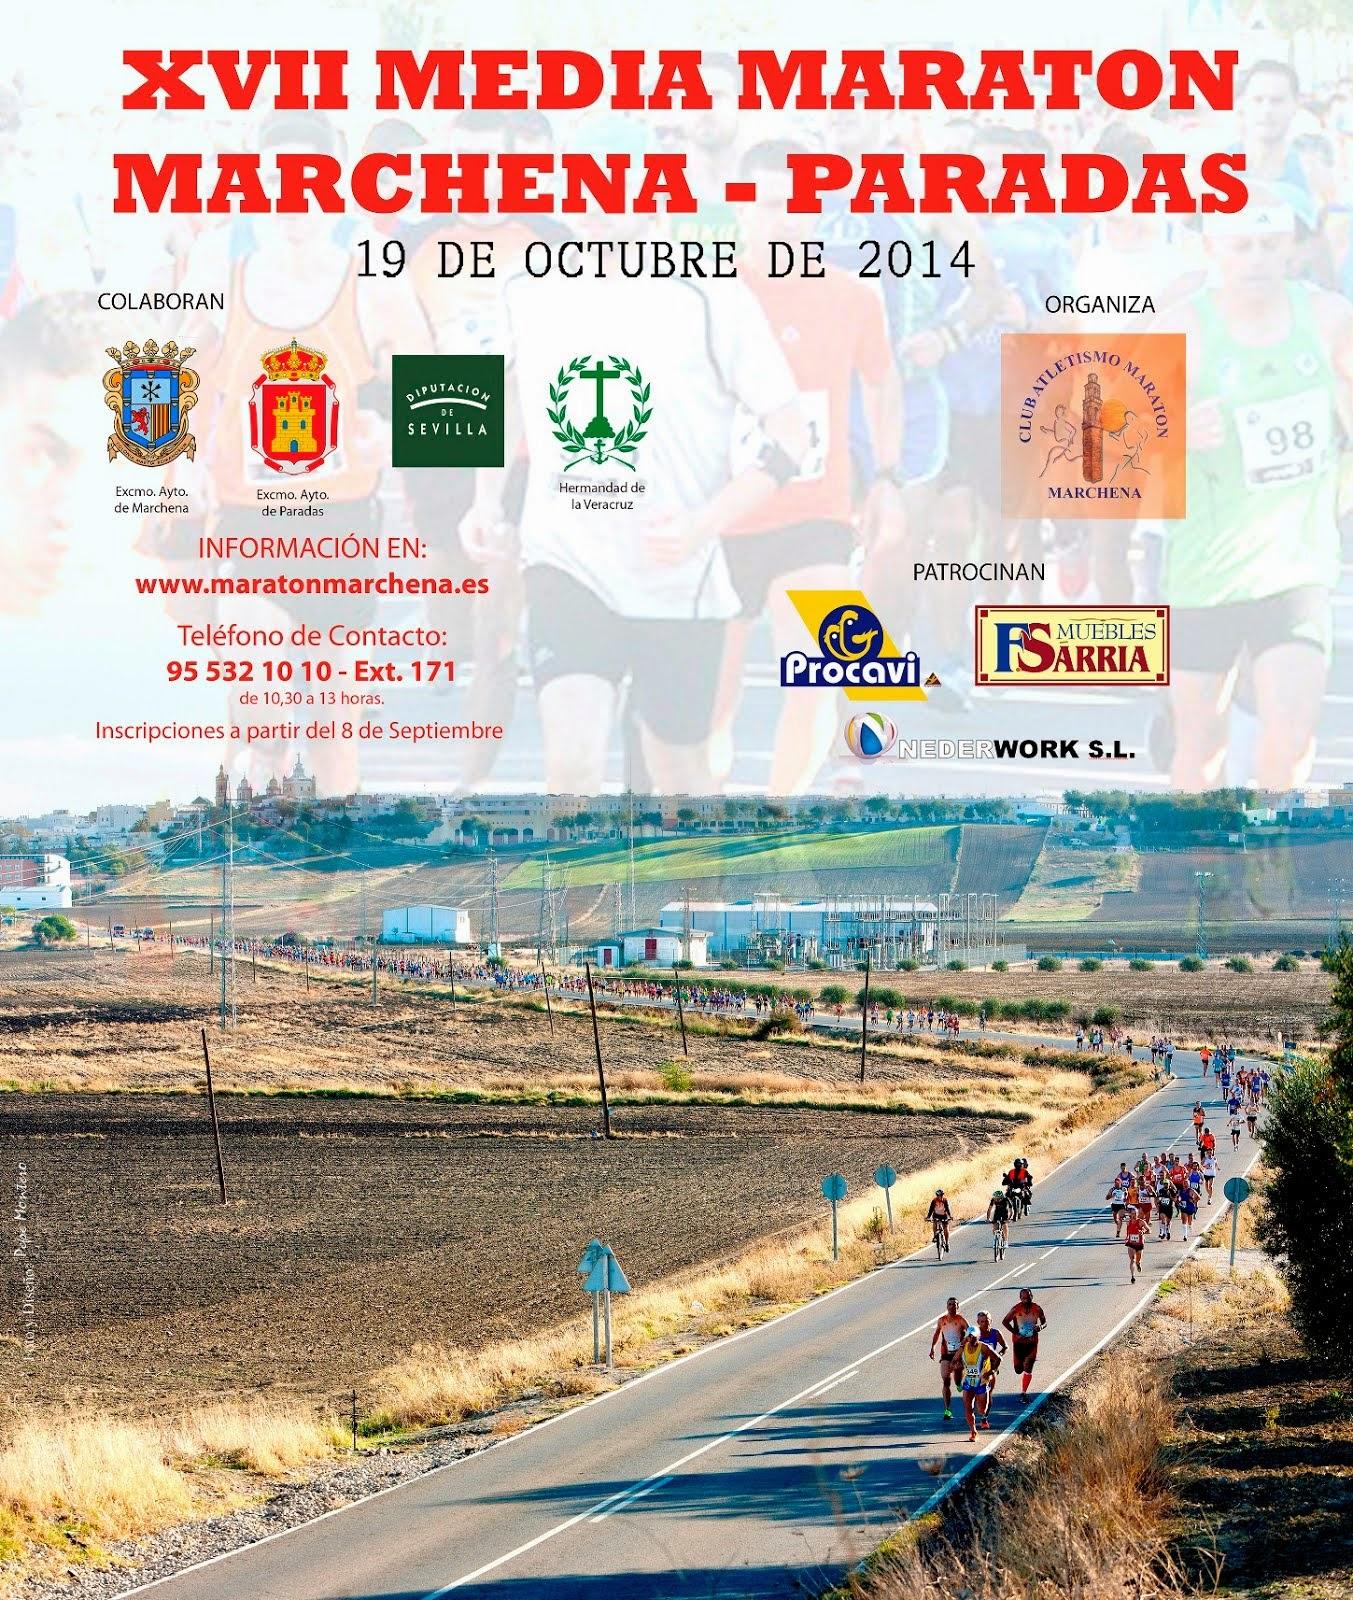 XVII Medio Maratón Marchena-Paradas